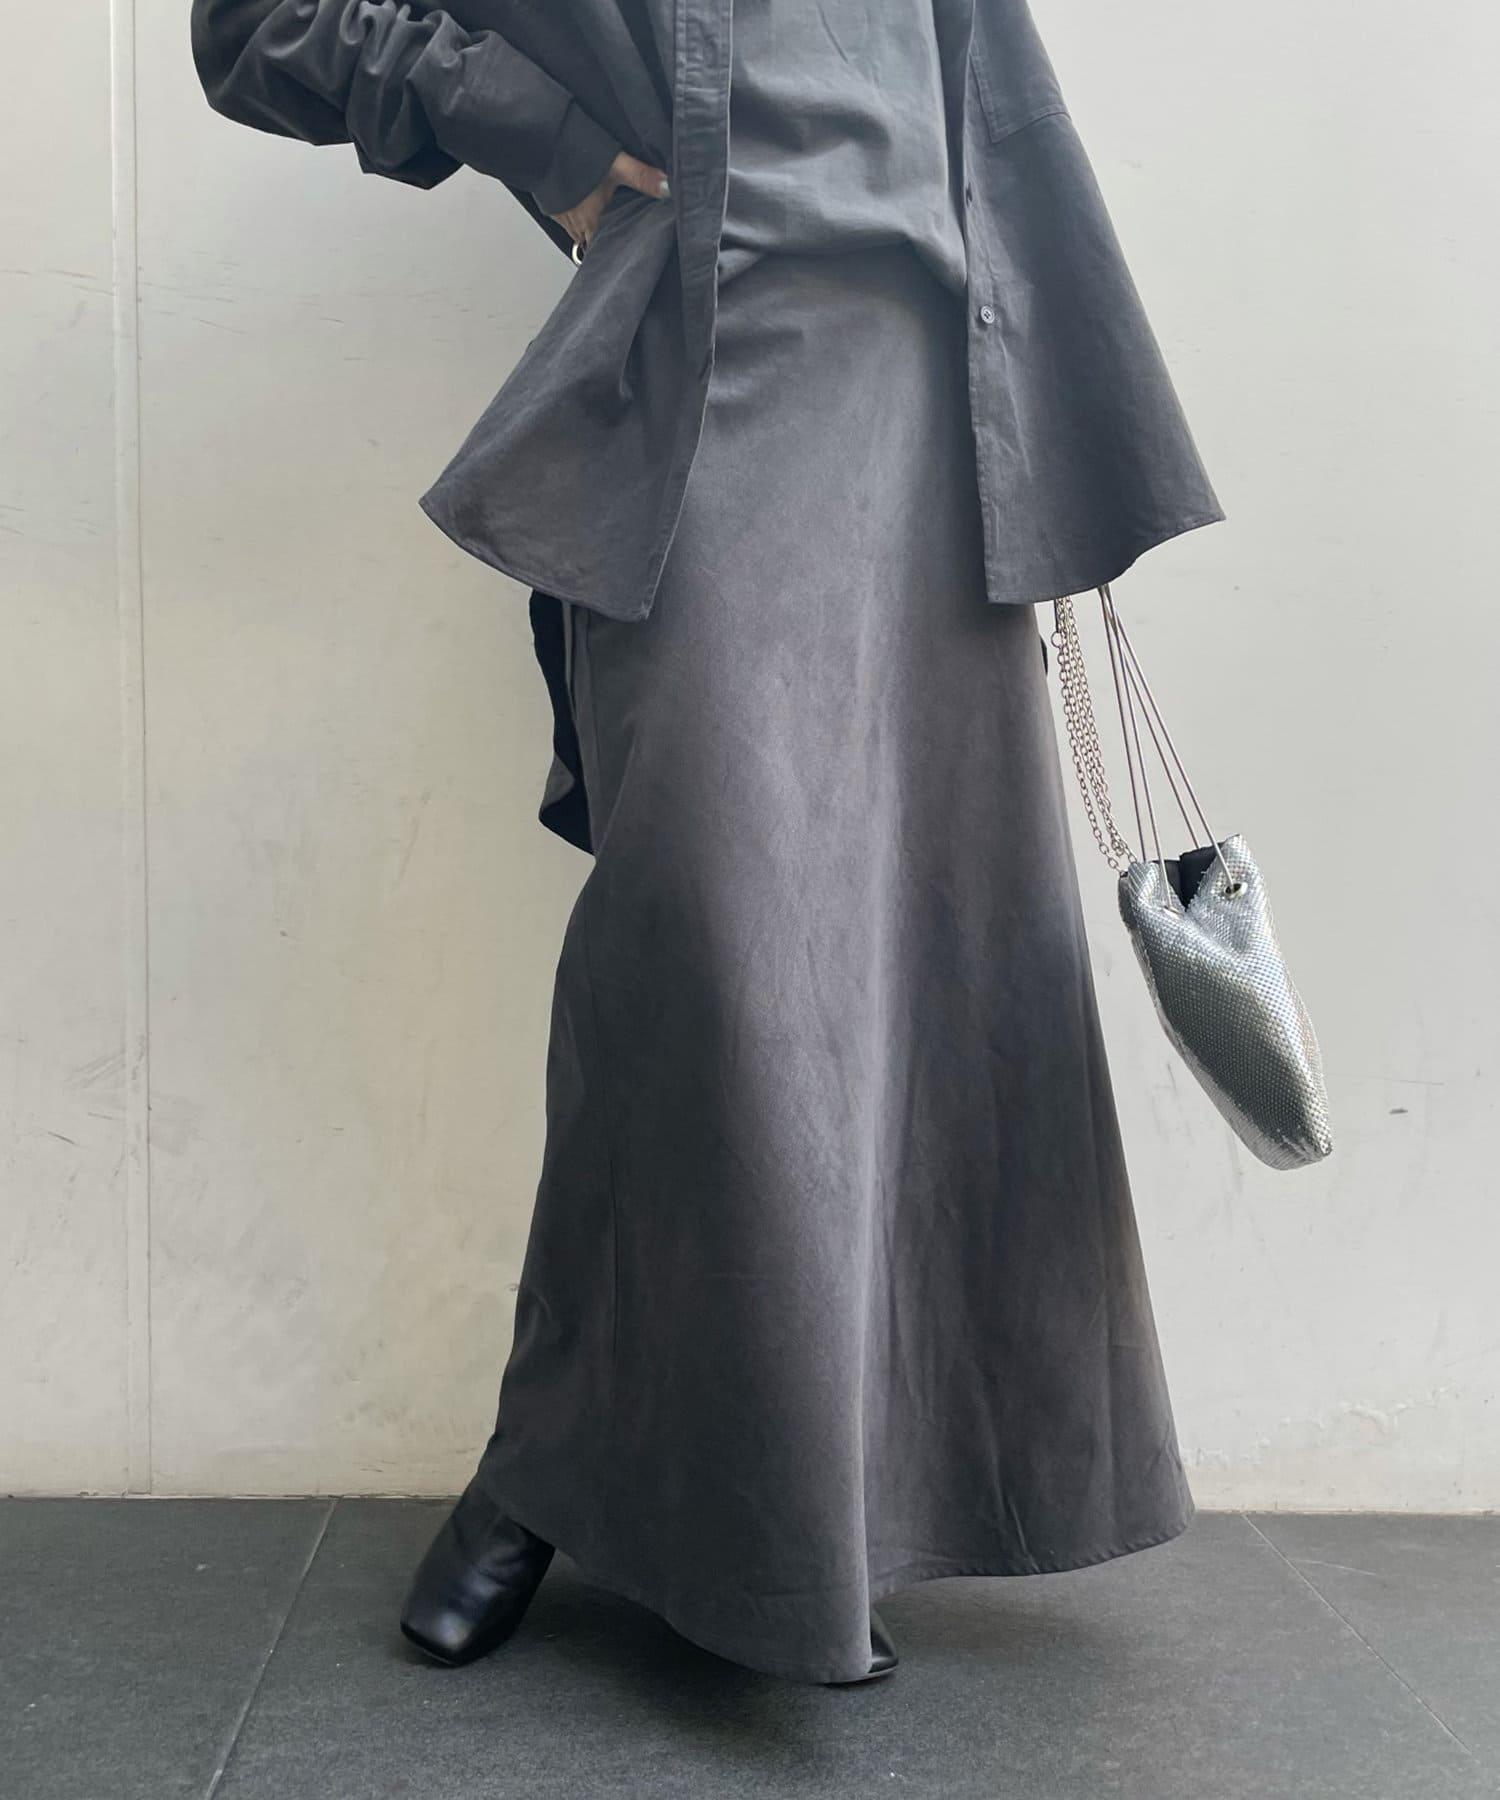 OUTLET(アウトレット) 【DouDou】セットアップコールテンスカート